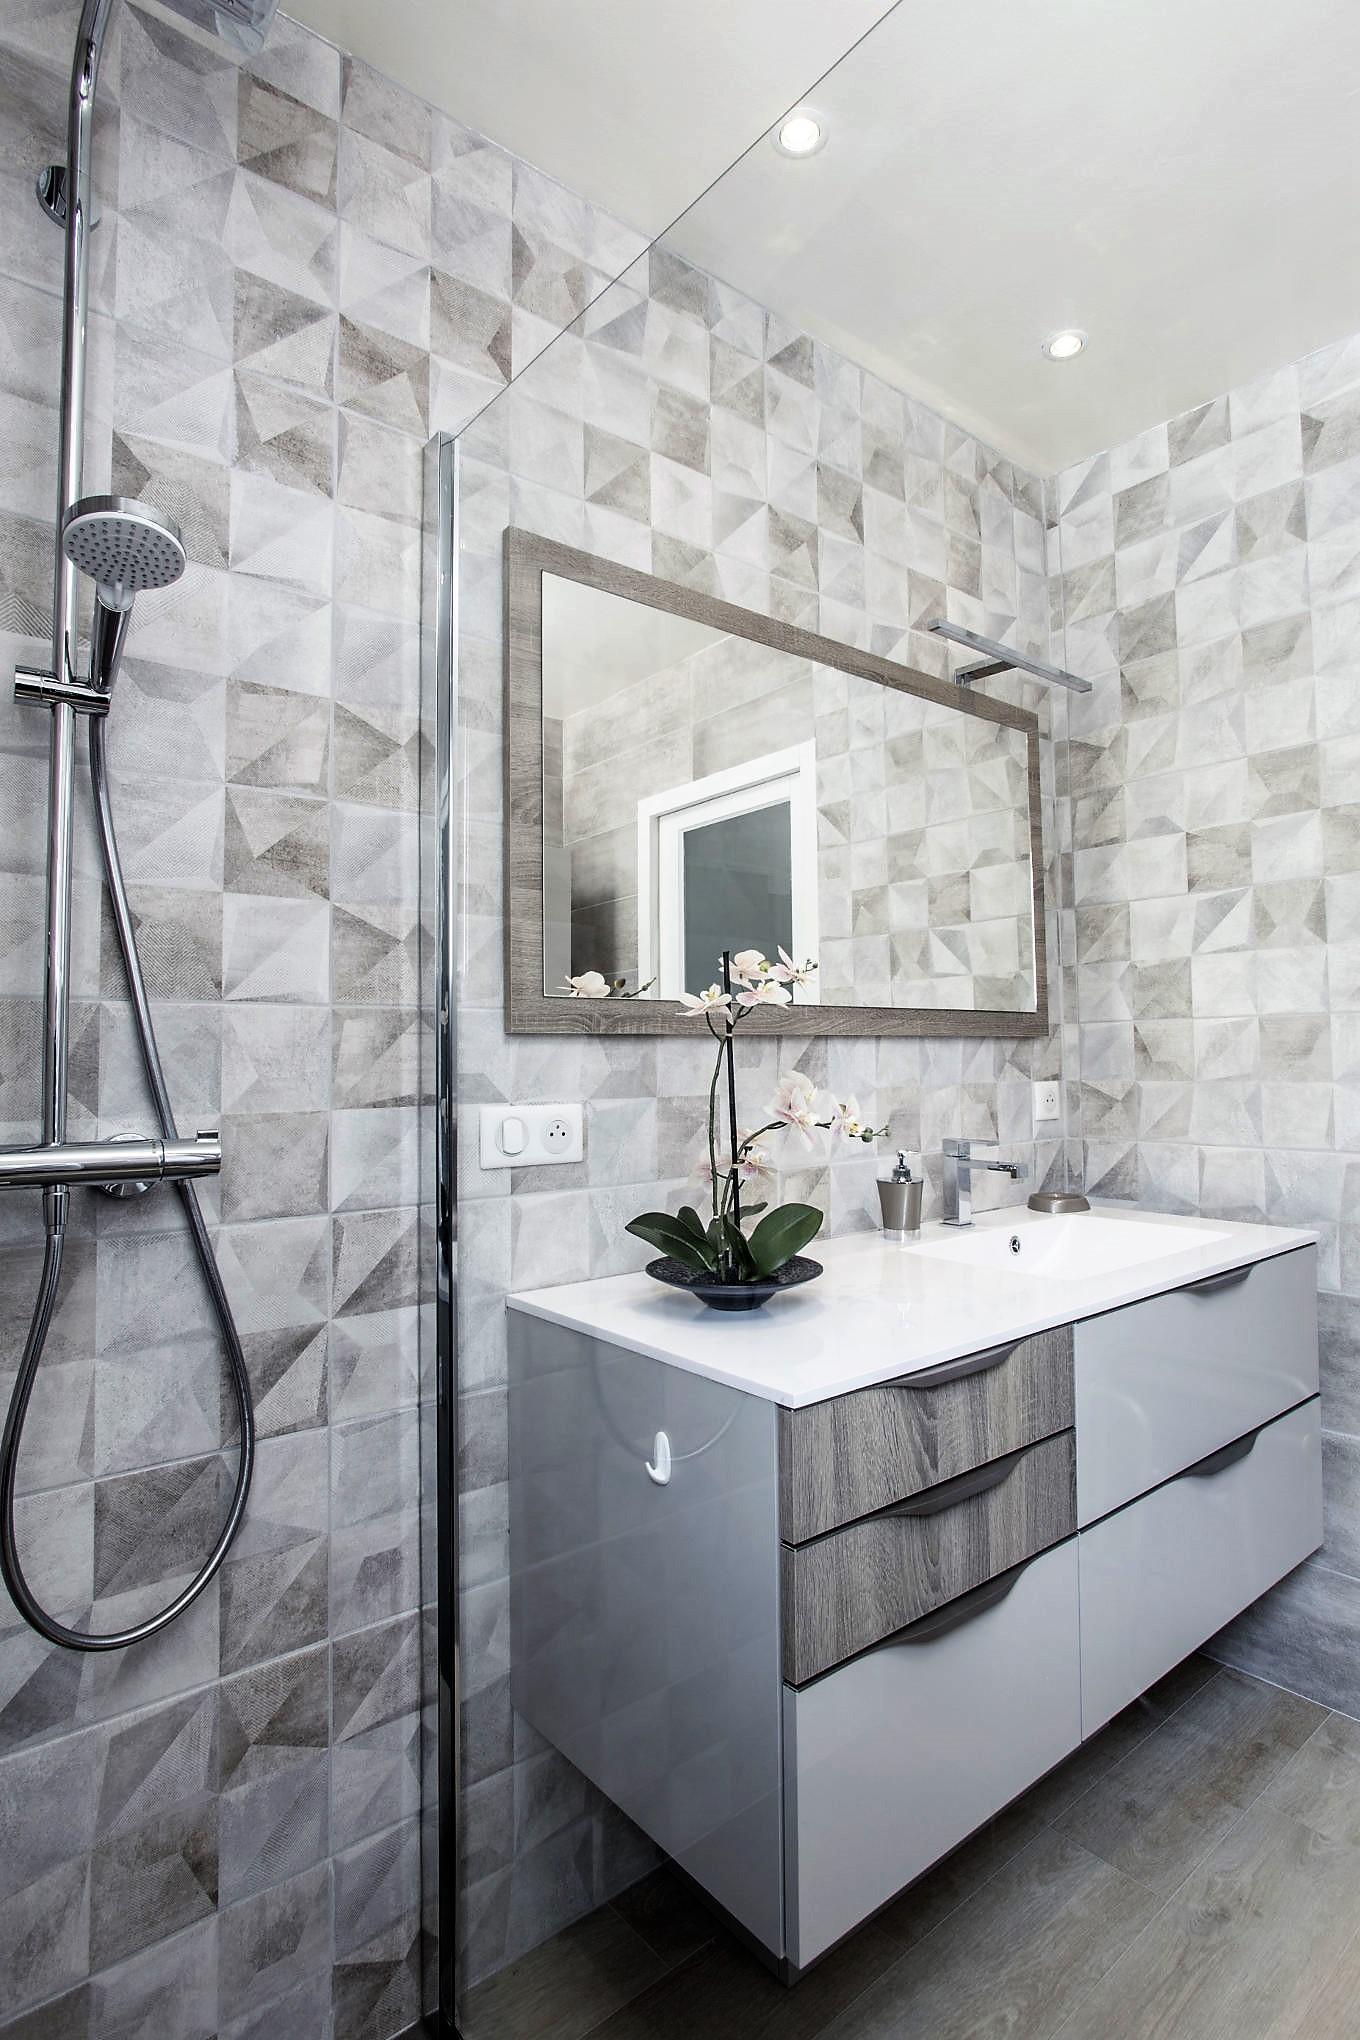 Salle de bains FUTURA MÉLAMINÉ CACHEMIRE CHENE BARDOLINO GRIS